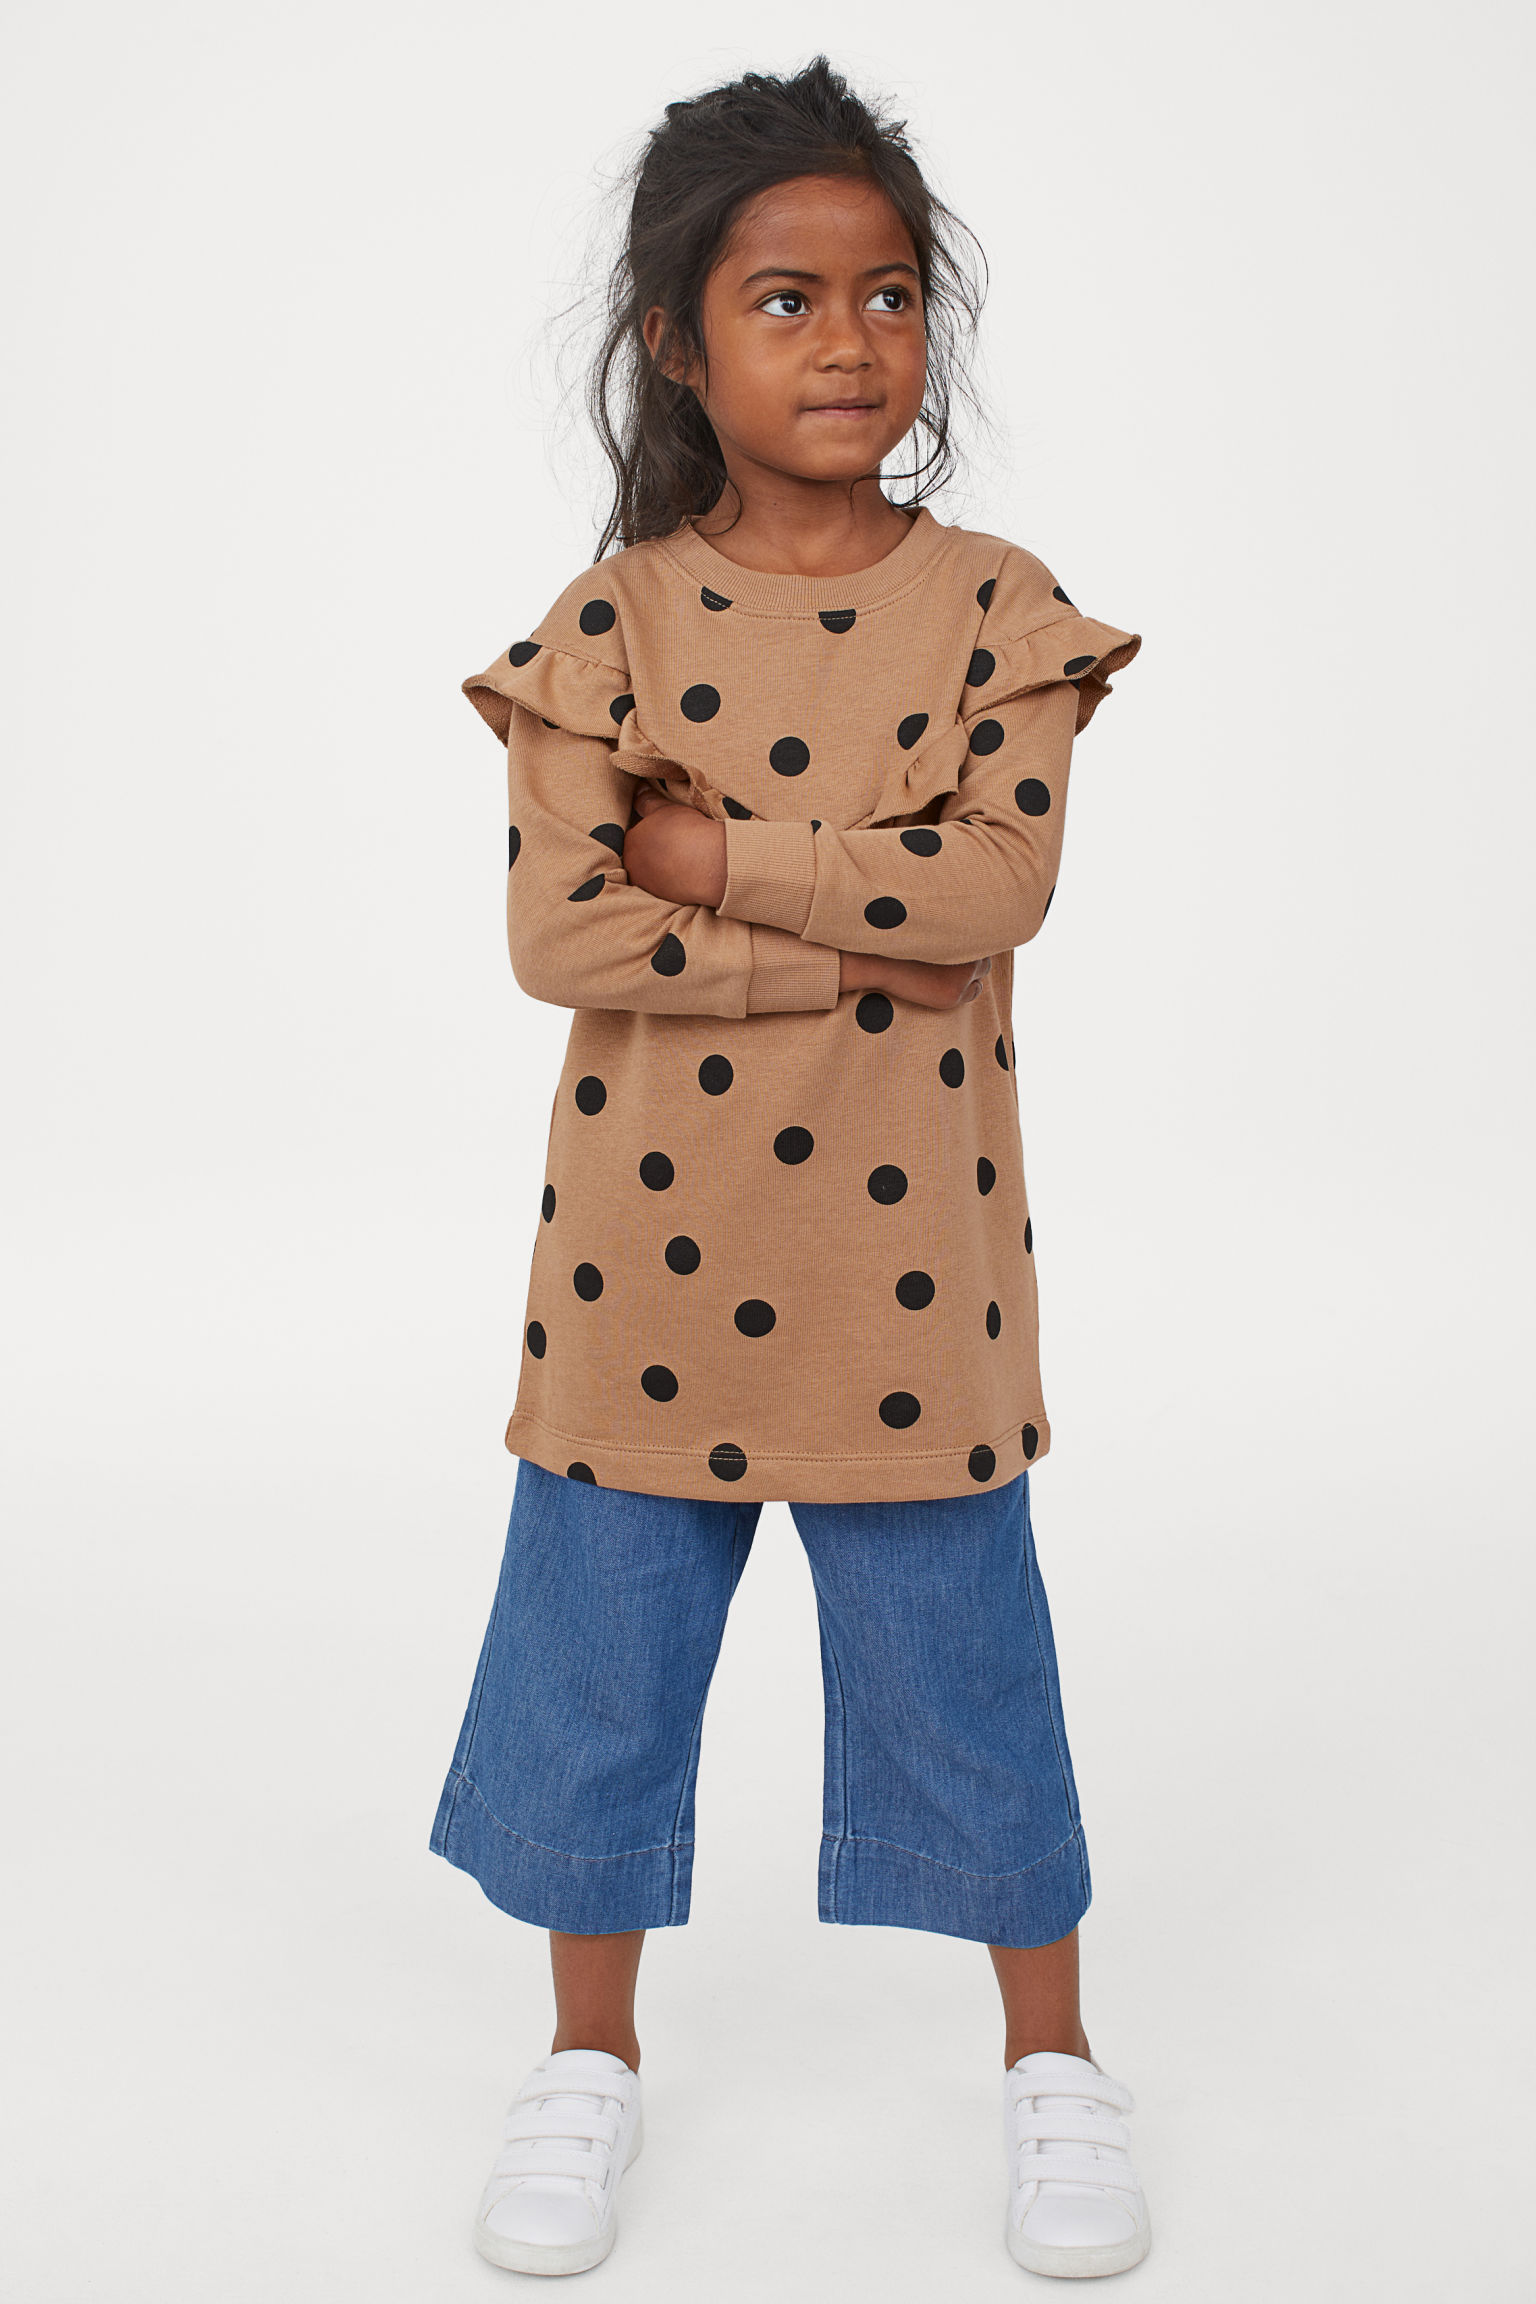 H&M Girls Flounced Sweatshirt Dress - Weekly finds, The Comfiest Cheetah Flats